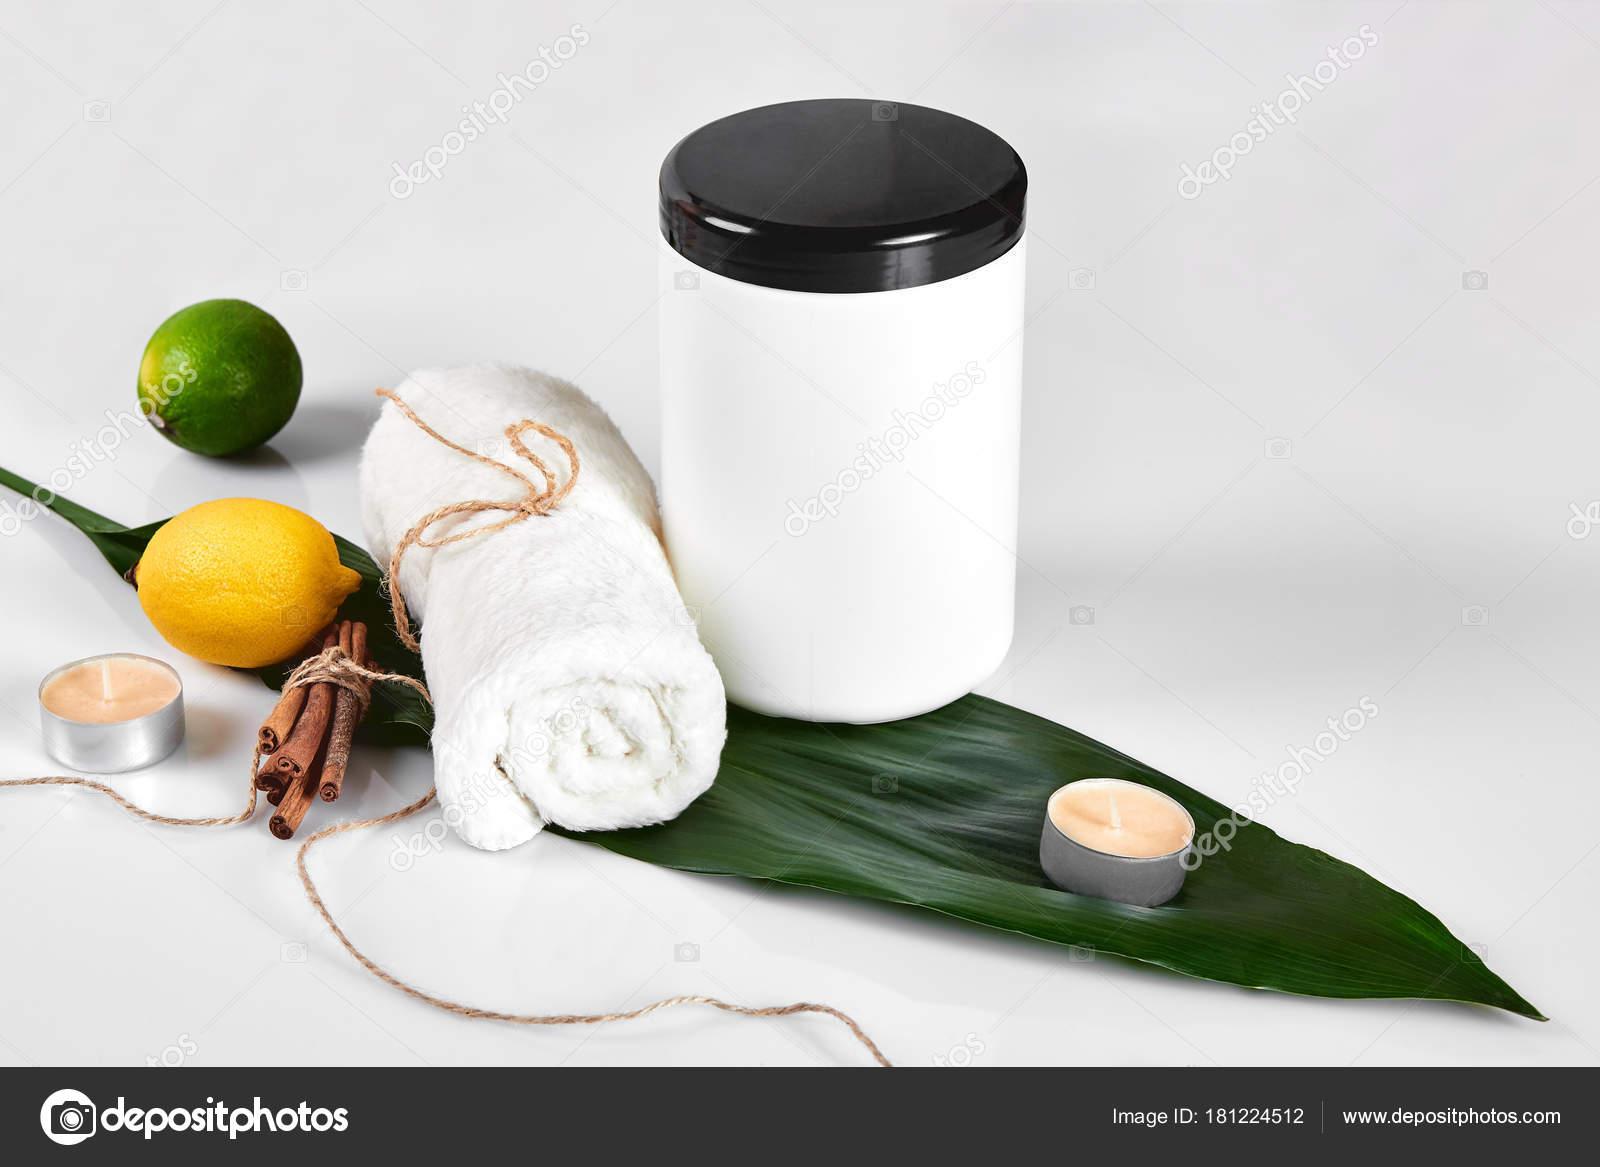 Skin care beauty treatment with jar of body moisturizer